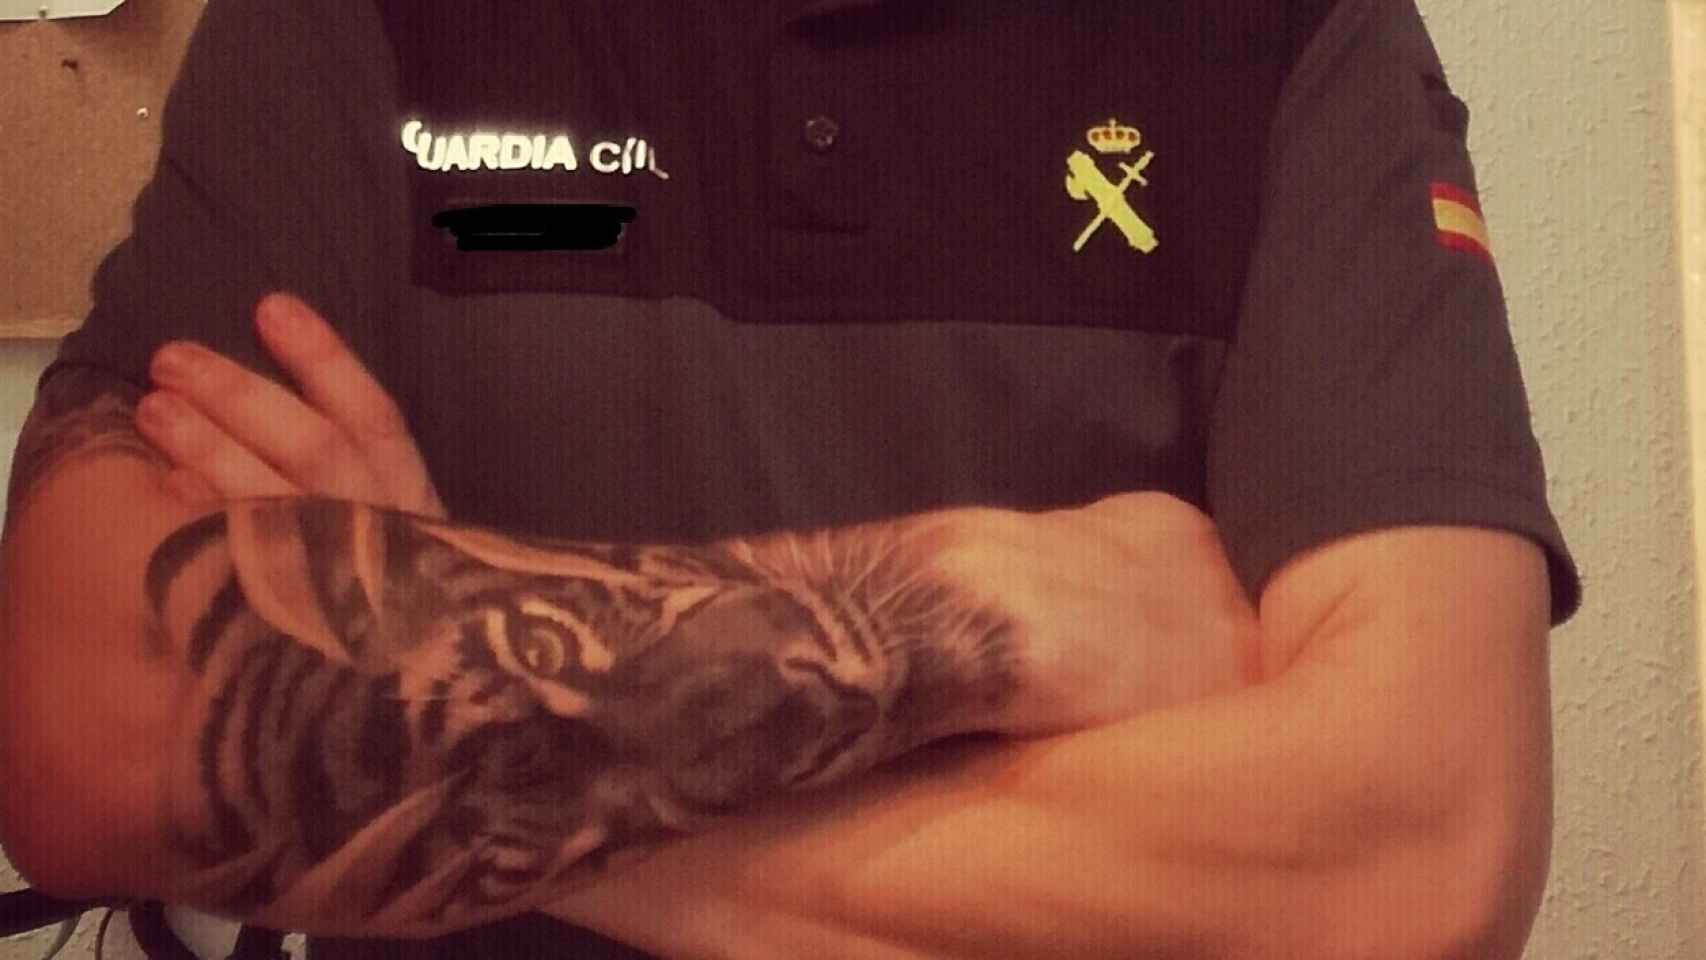 Marlaska pide consenso acerca de la normativa que regulará los tatuajes en la Guardia Civil